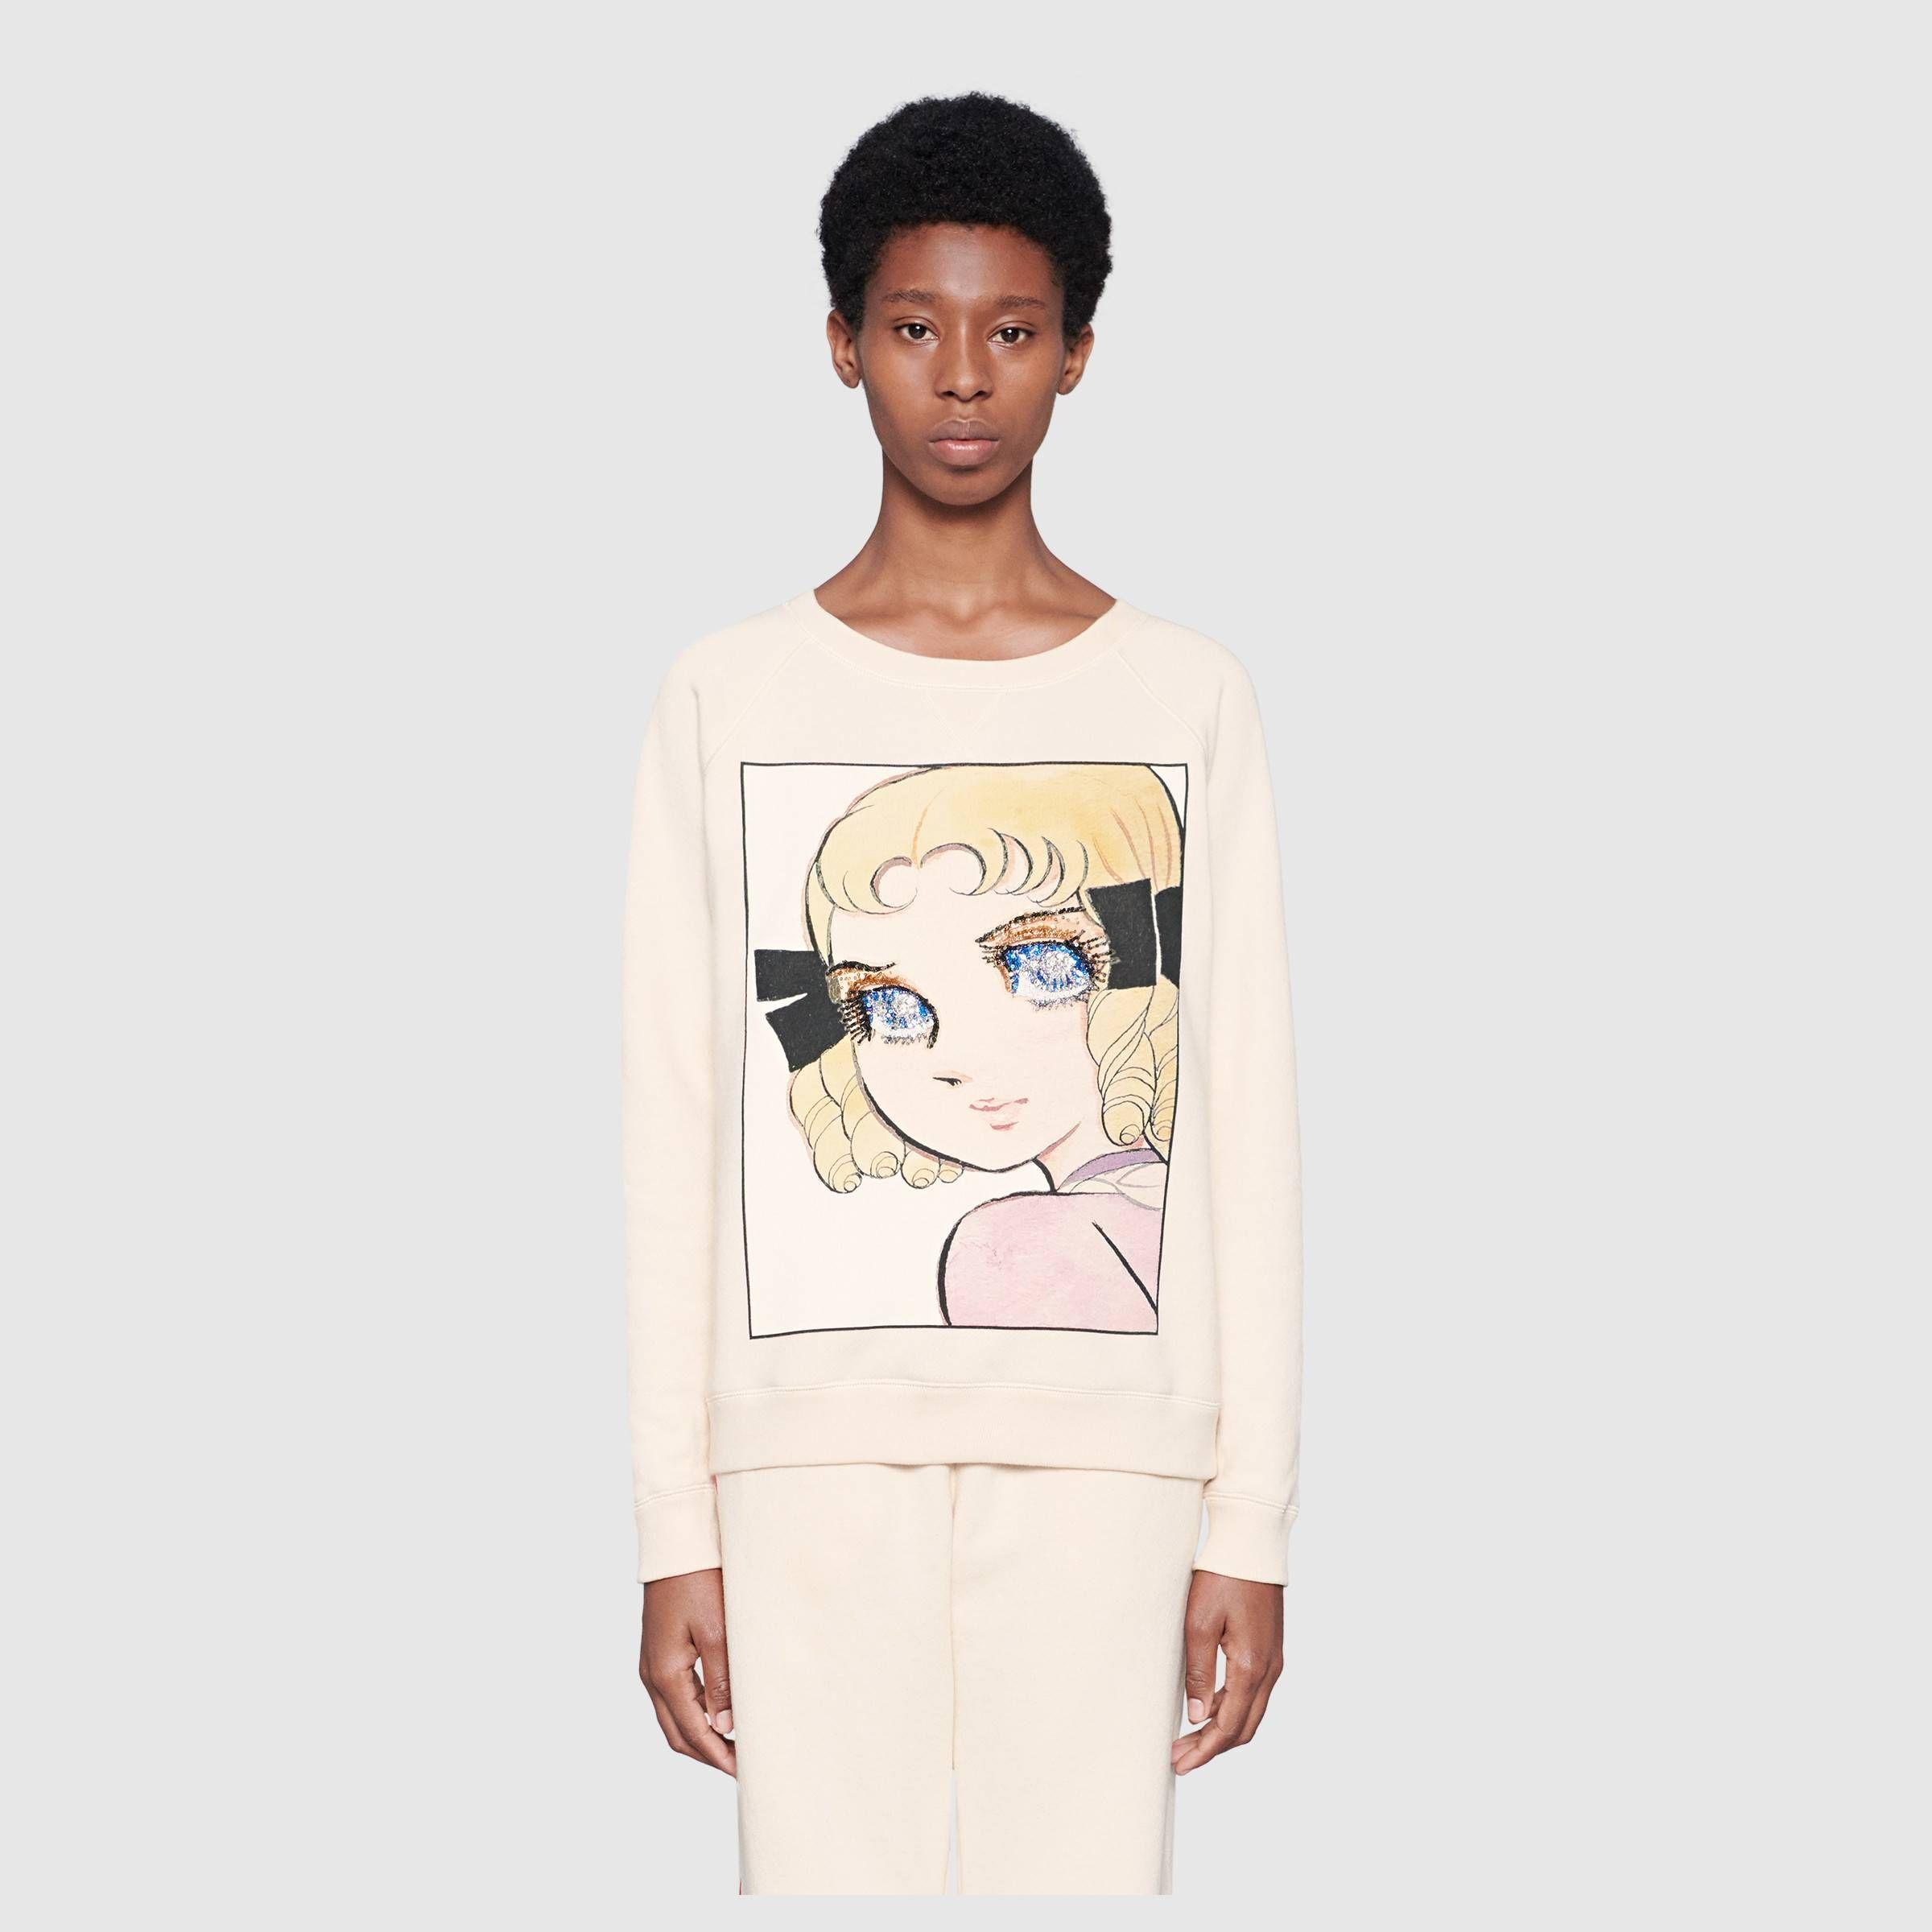 Cotton Sweatshirt With Manga Print In Off White Heavy Felted Cotton Gucci Women S Sweatshirts Sweatshirts Women Cotton Sweatshirts Sweatshirts [ 2400 x 2400 Pixel ]